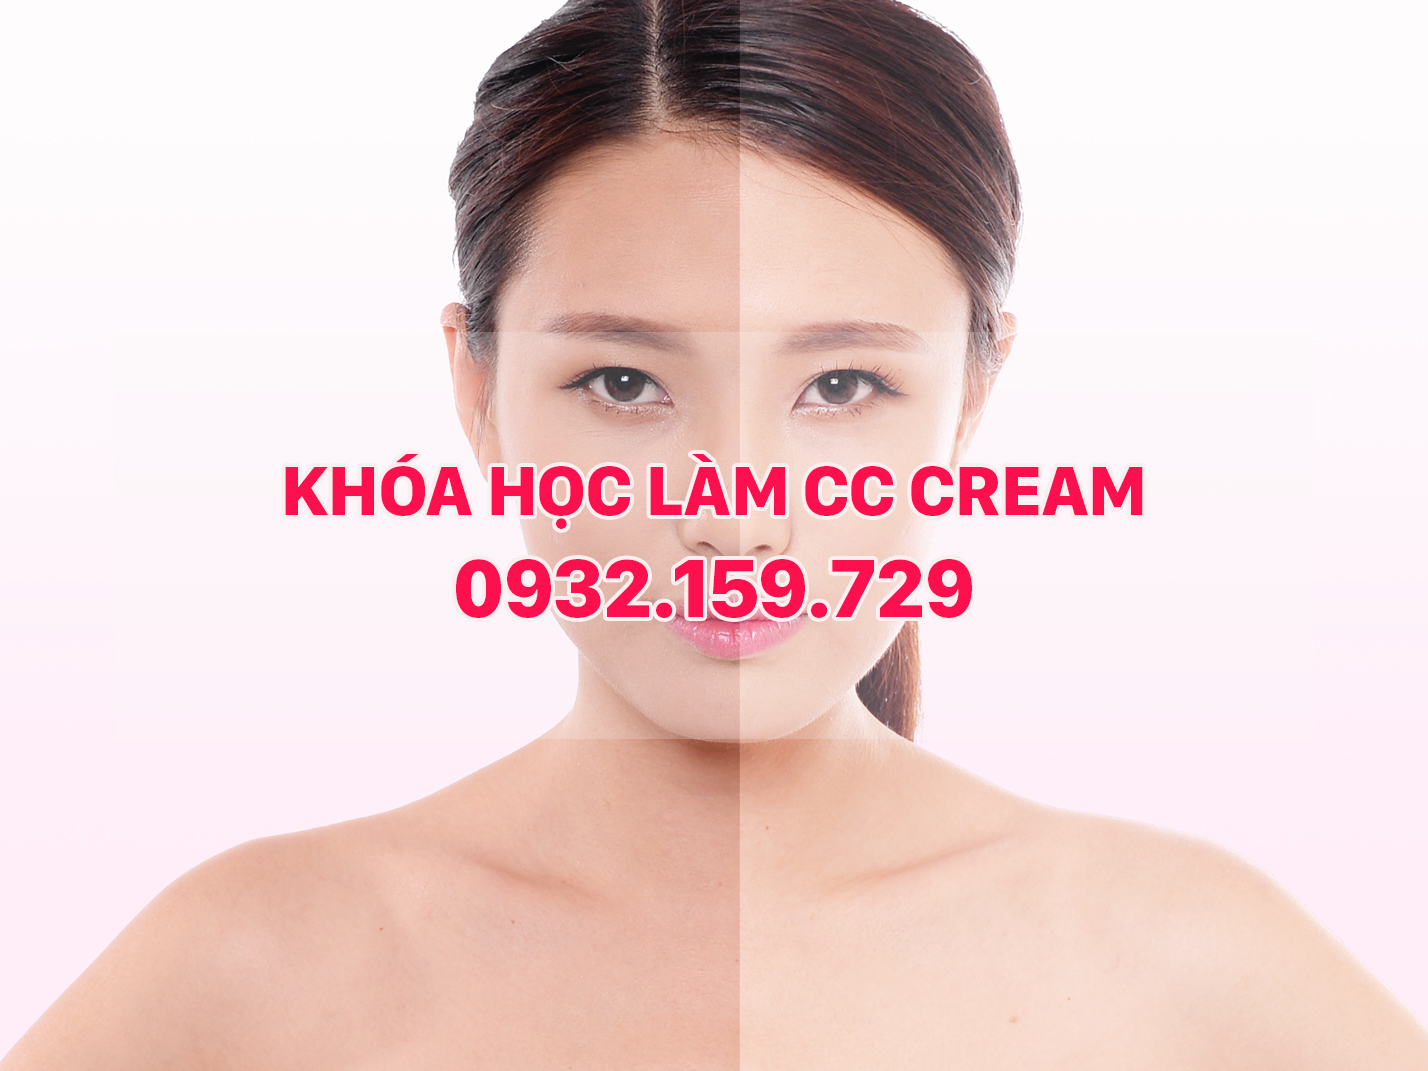 Khóa học làm cc cream